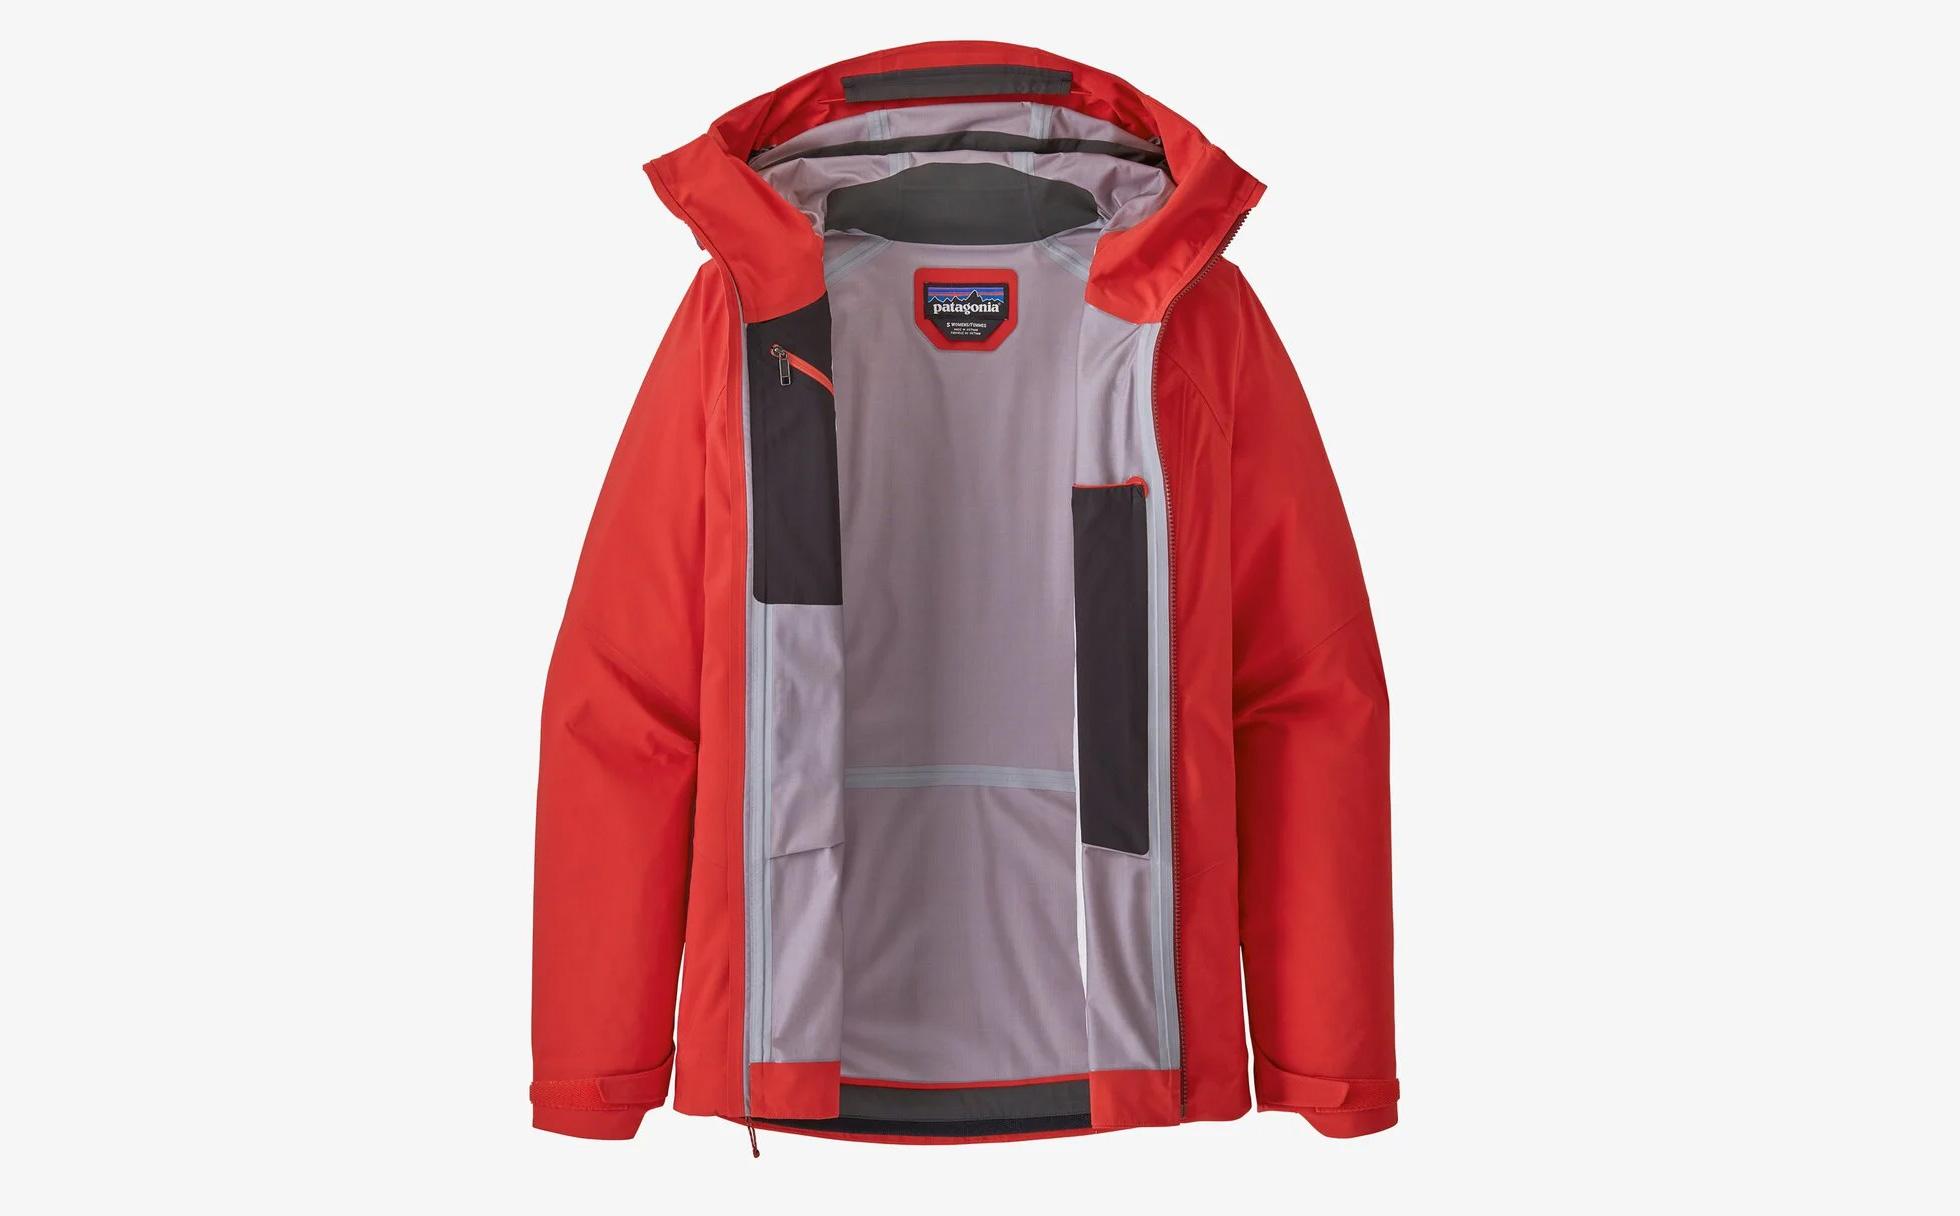 patagonia storm stride jacket